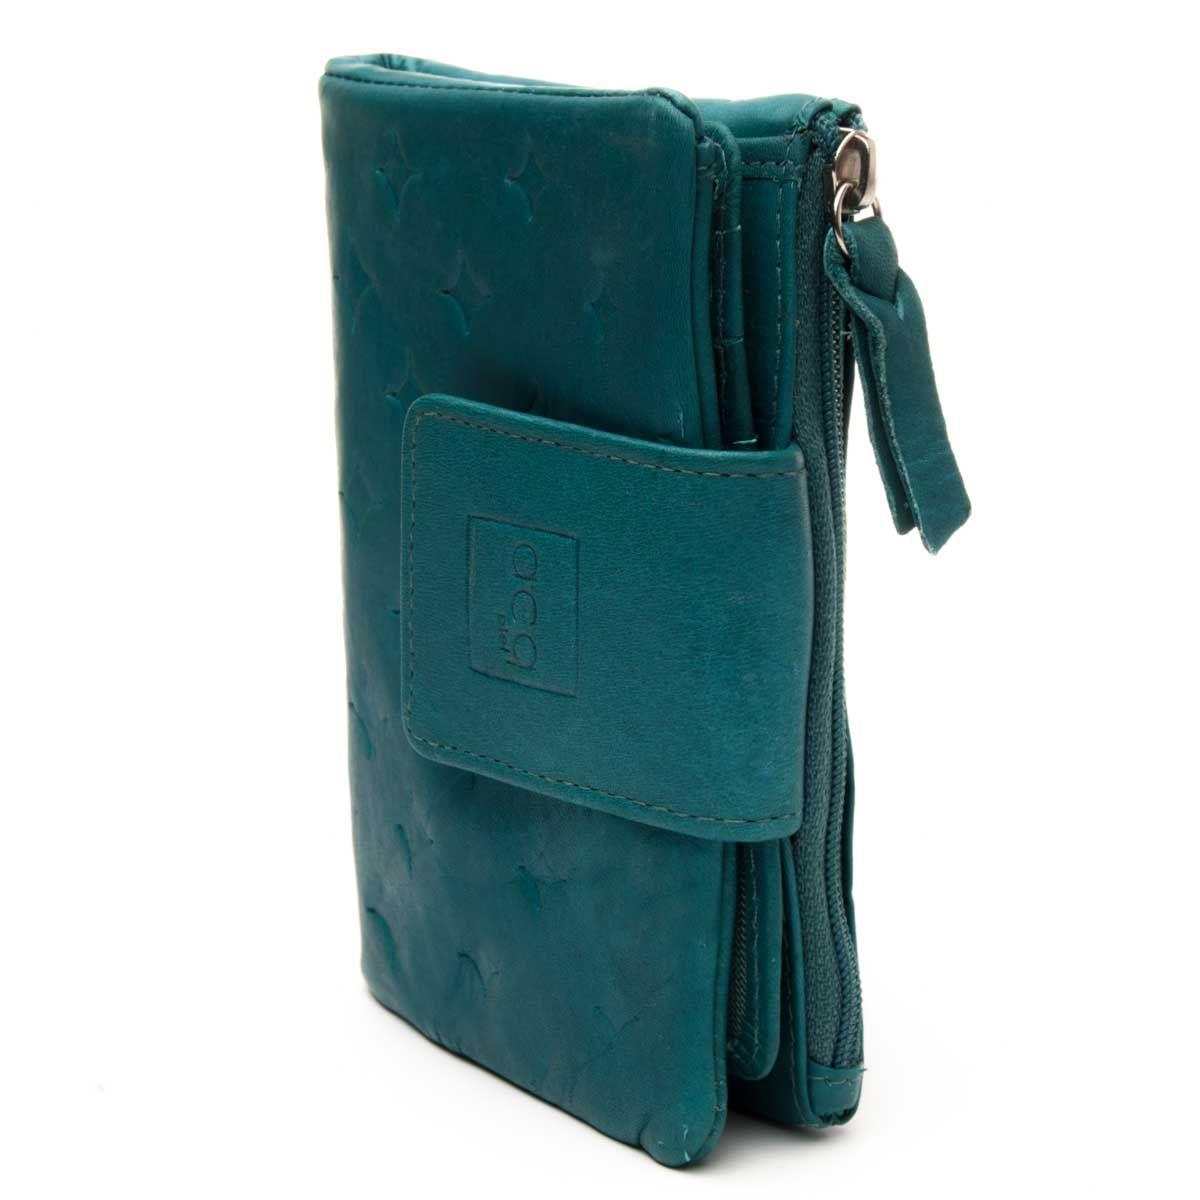 Montevita Leather Purse in Blue